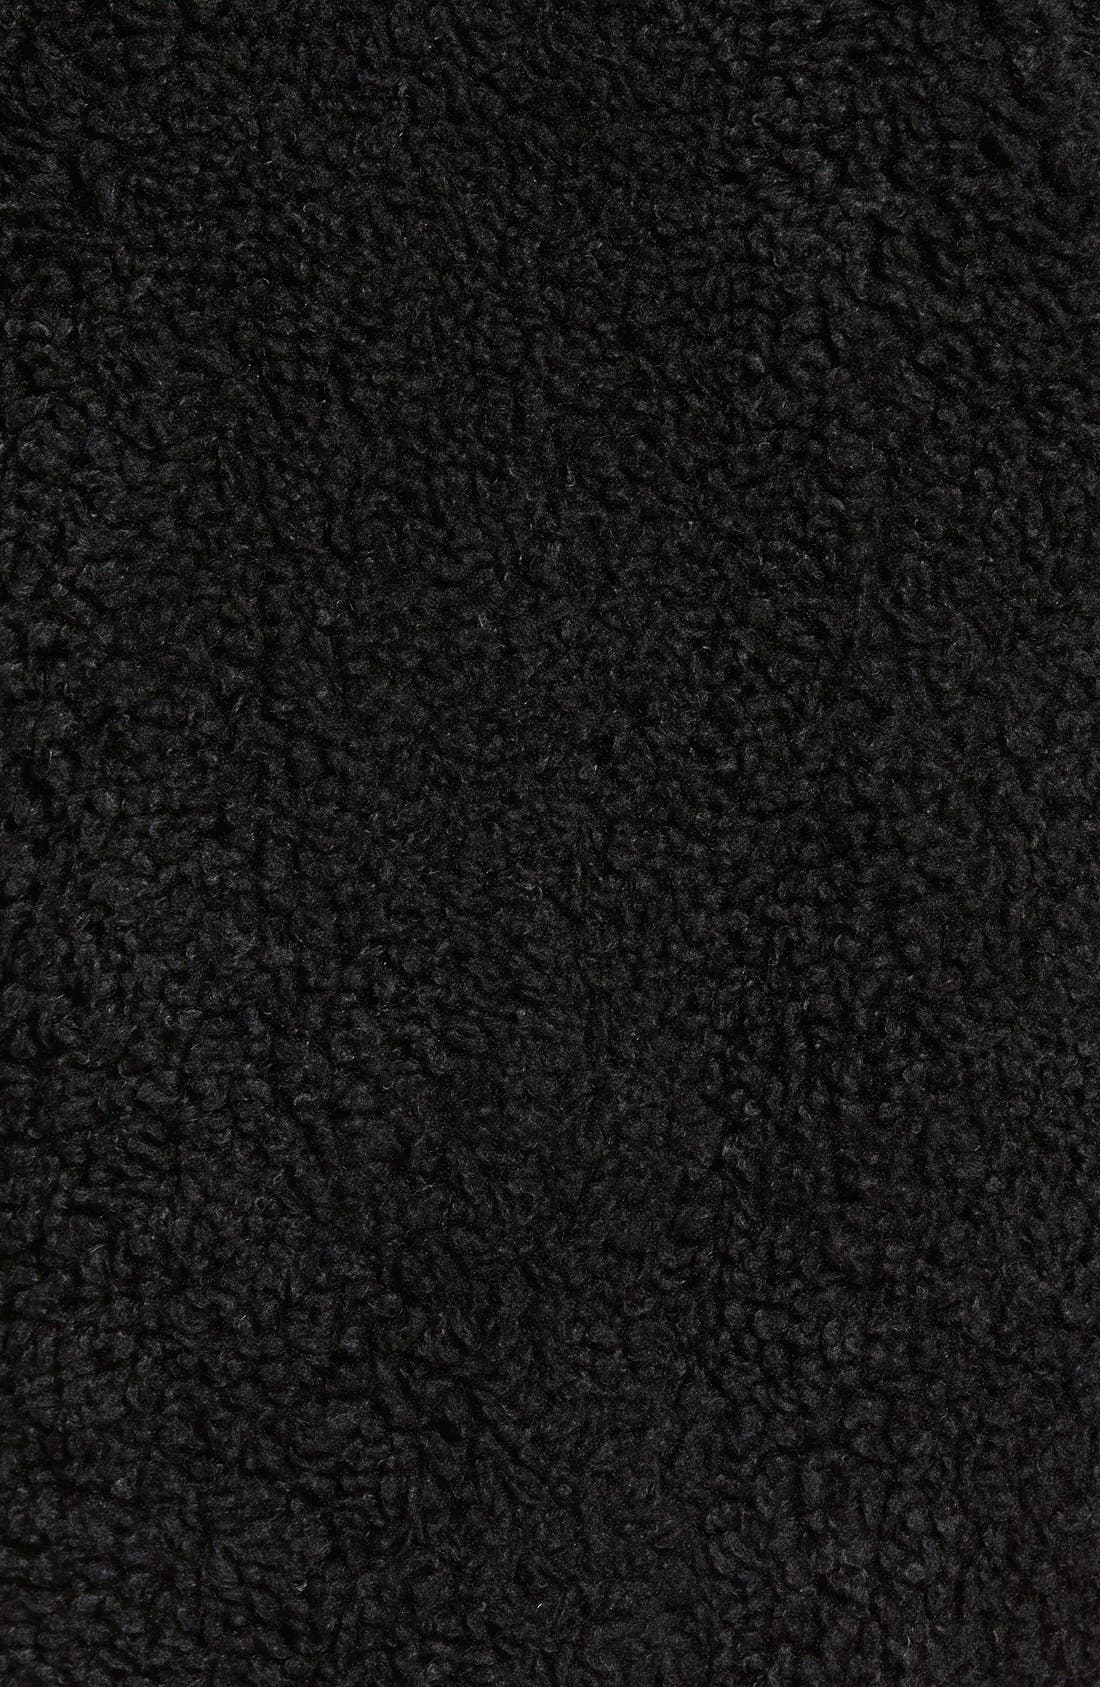 'Teddy Bear' Notch Collar Reversible Faux Fur Coat,                             Alternate thumbnail 3, color,                             001